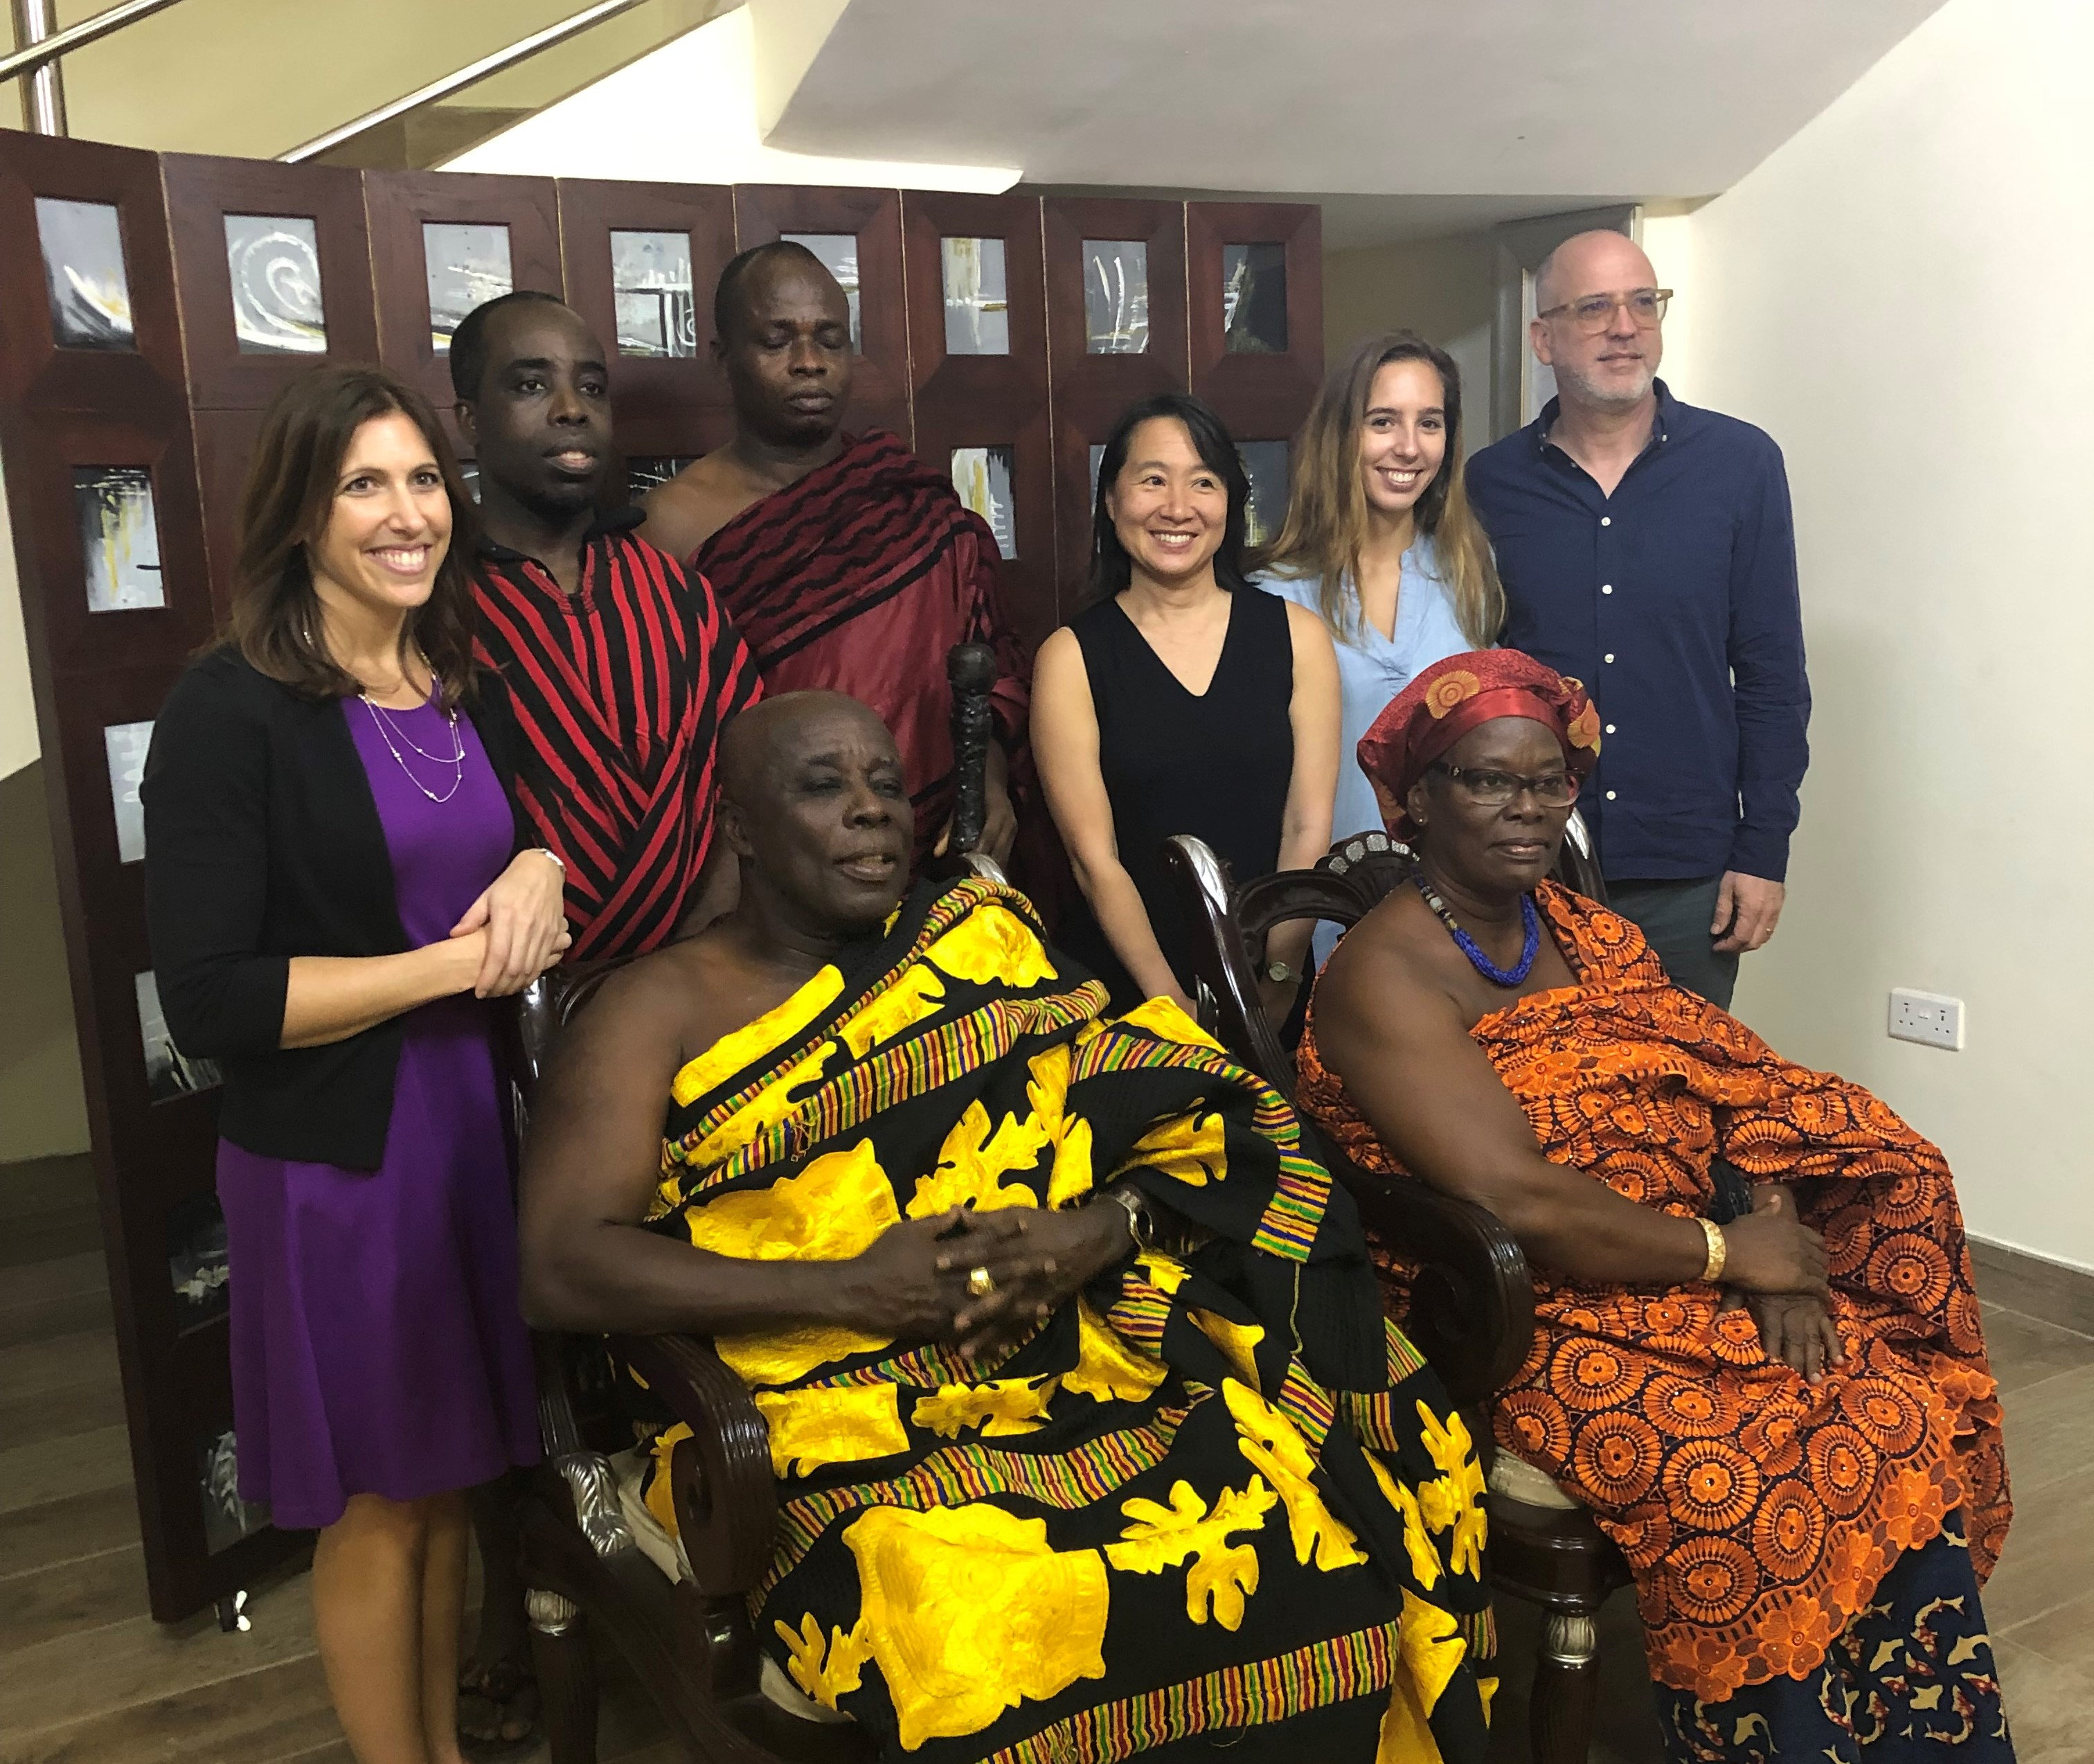 WPI faculty meeting the Okyenhene (the King of Akyem Abuakwa) in Kyebi, Ghana.